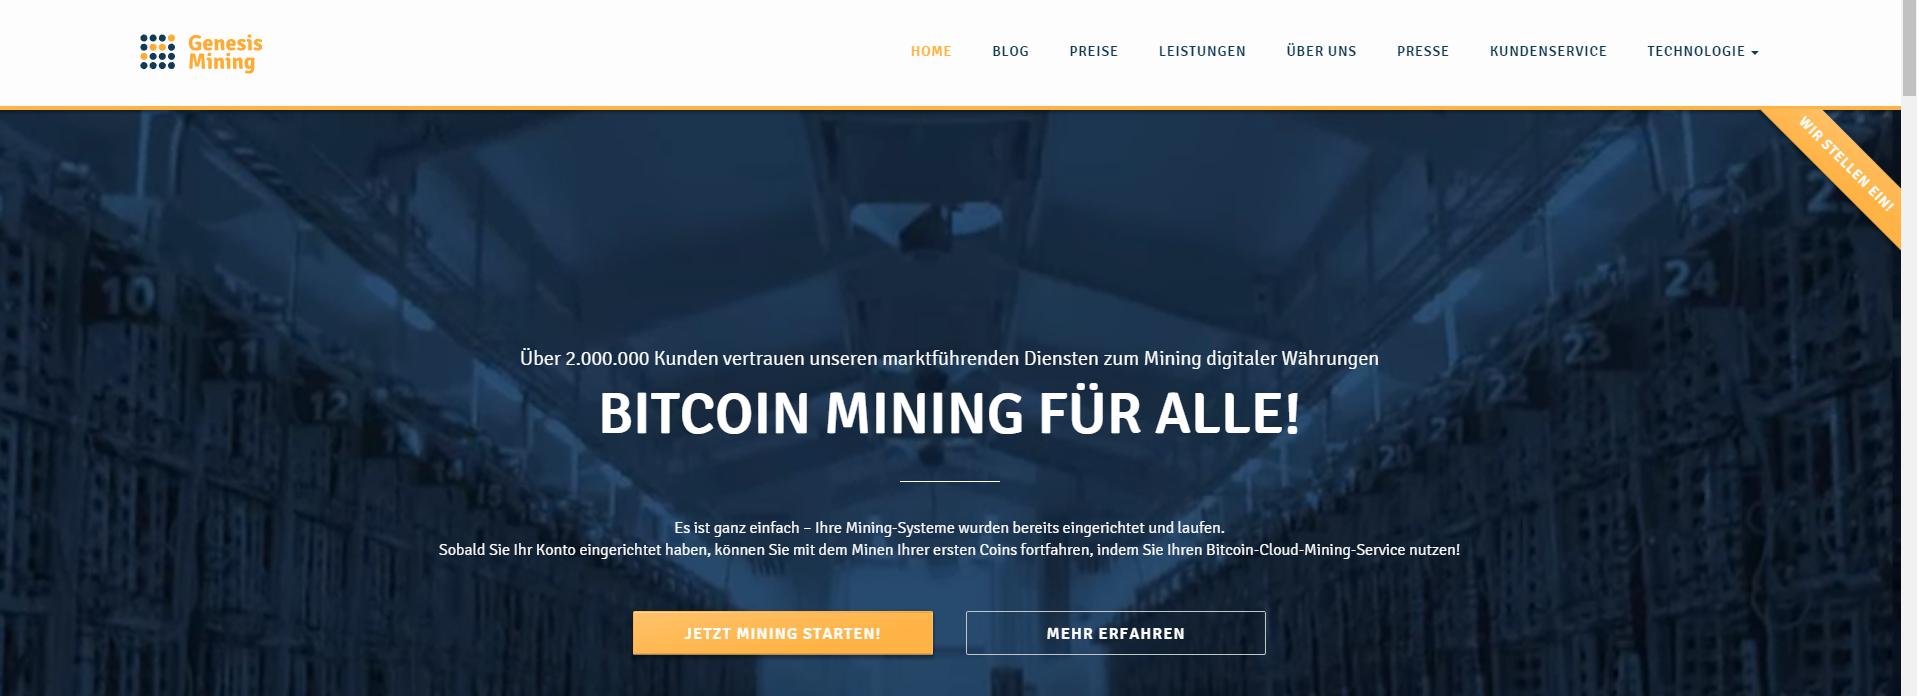 genesis-mining-ethereum-cloud-mining